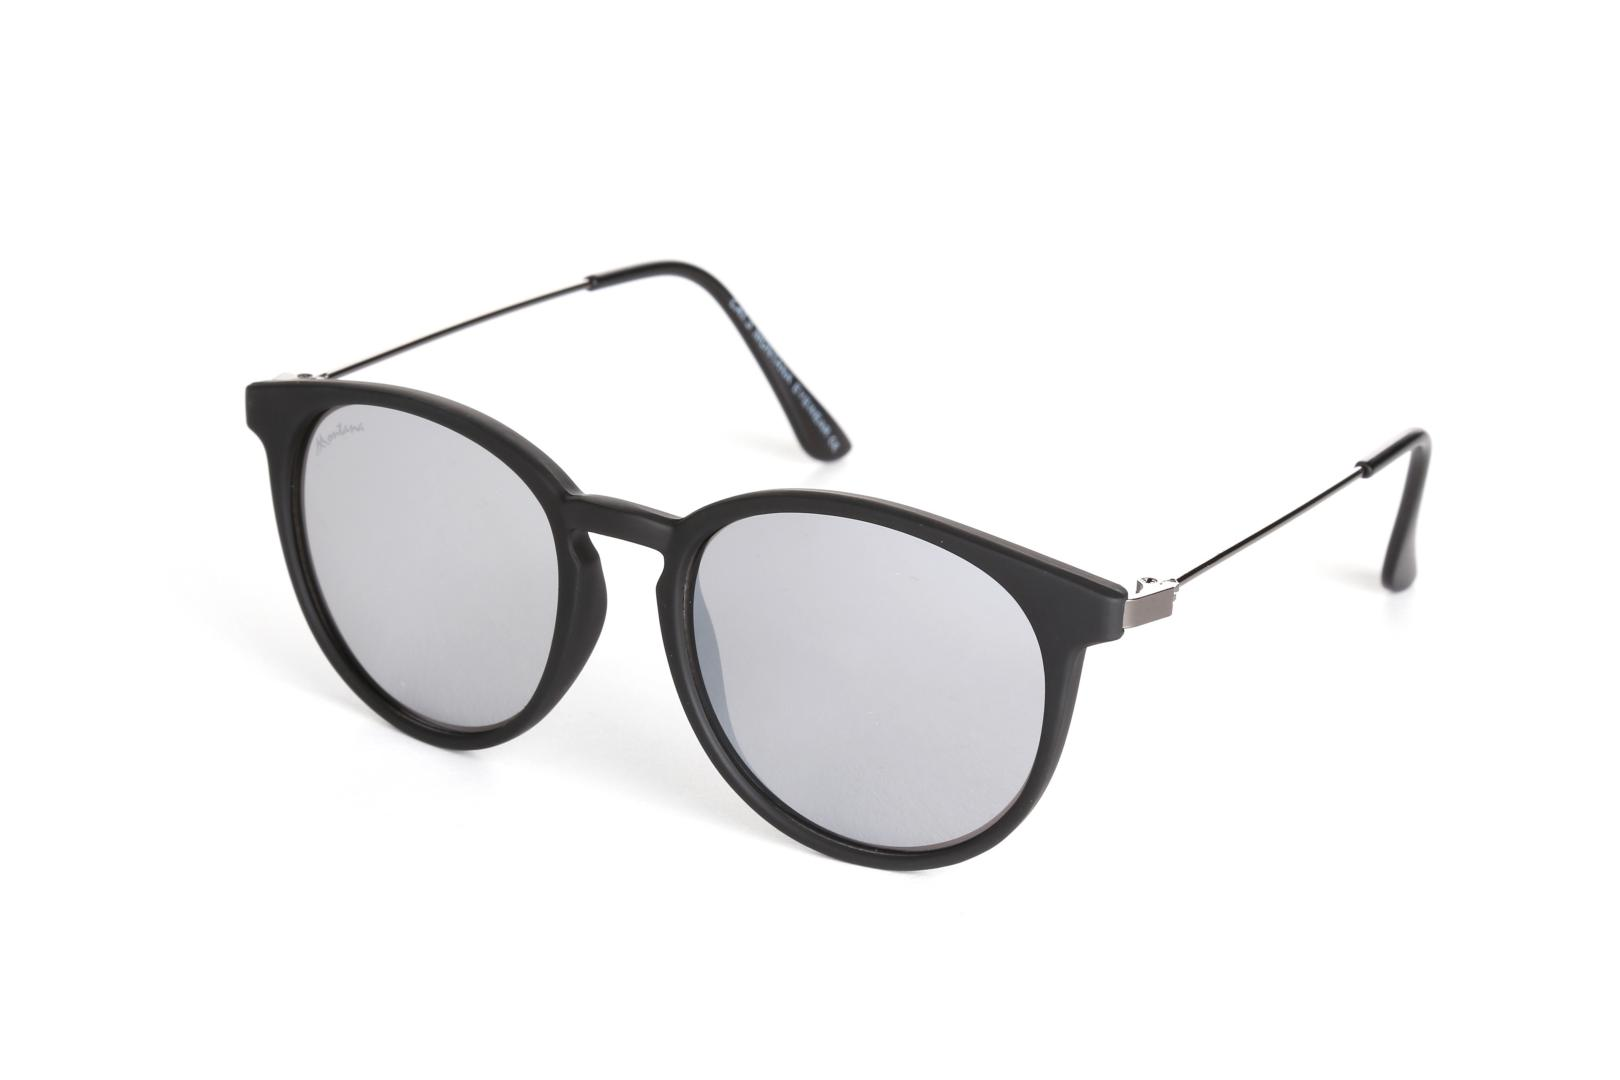 Montana Eyewear MS20-Schwarz-Blau j7g6sTHgFI